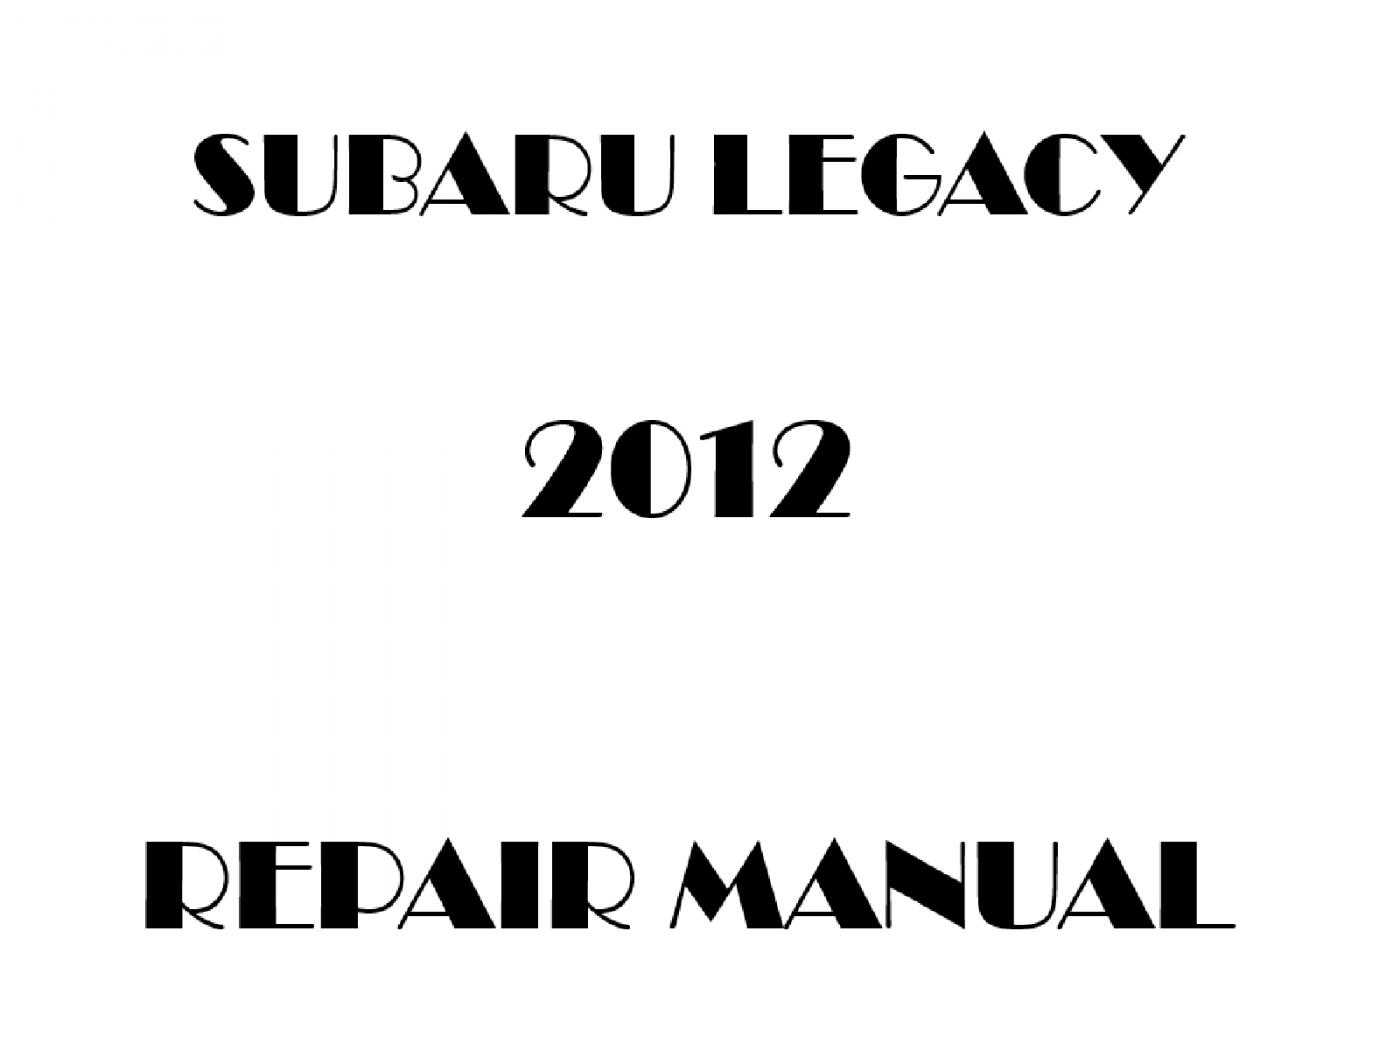 2012 Subaru Legacy repair manual